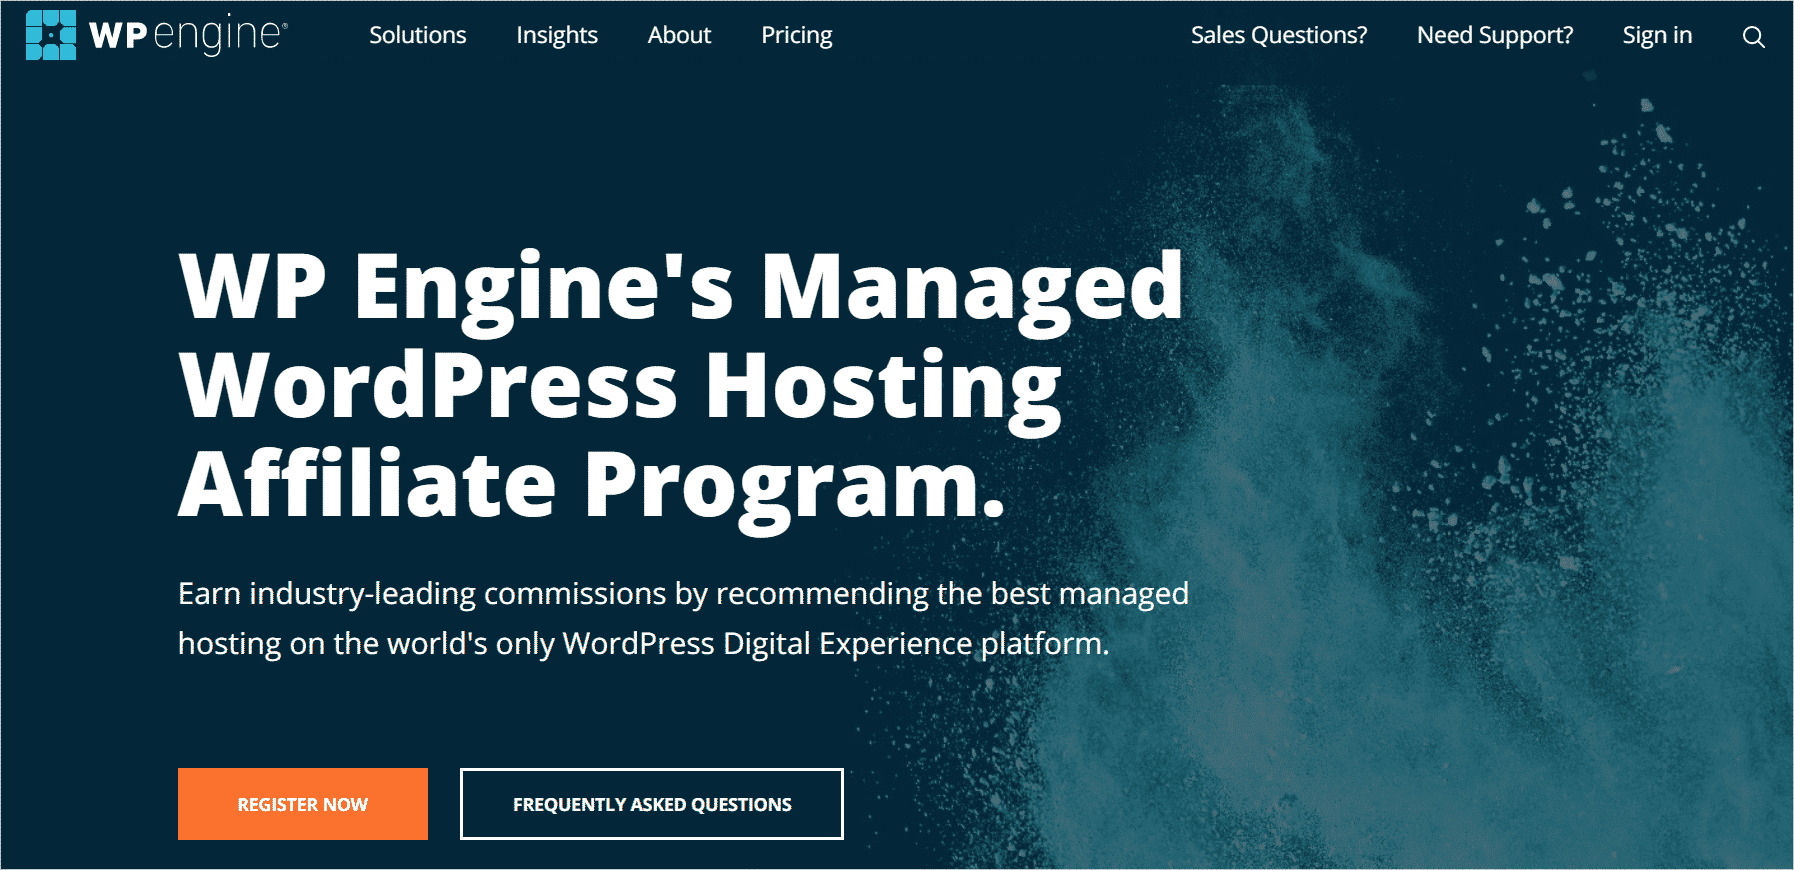 WP Engine Affiliate